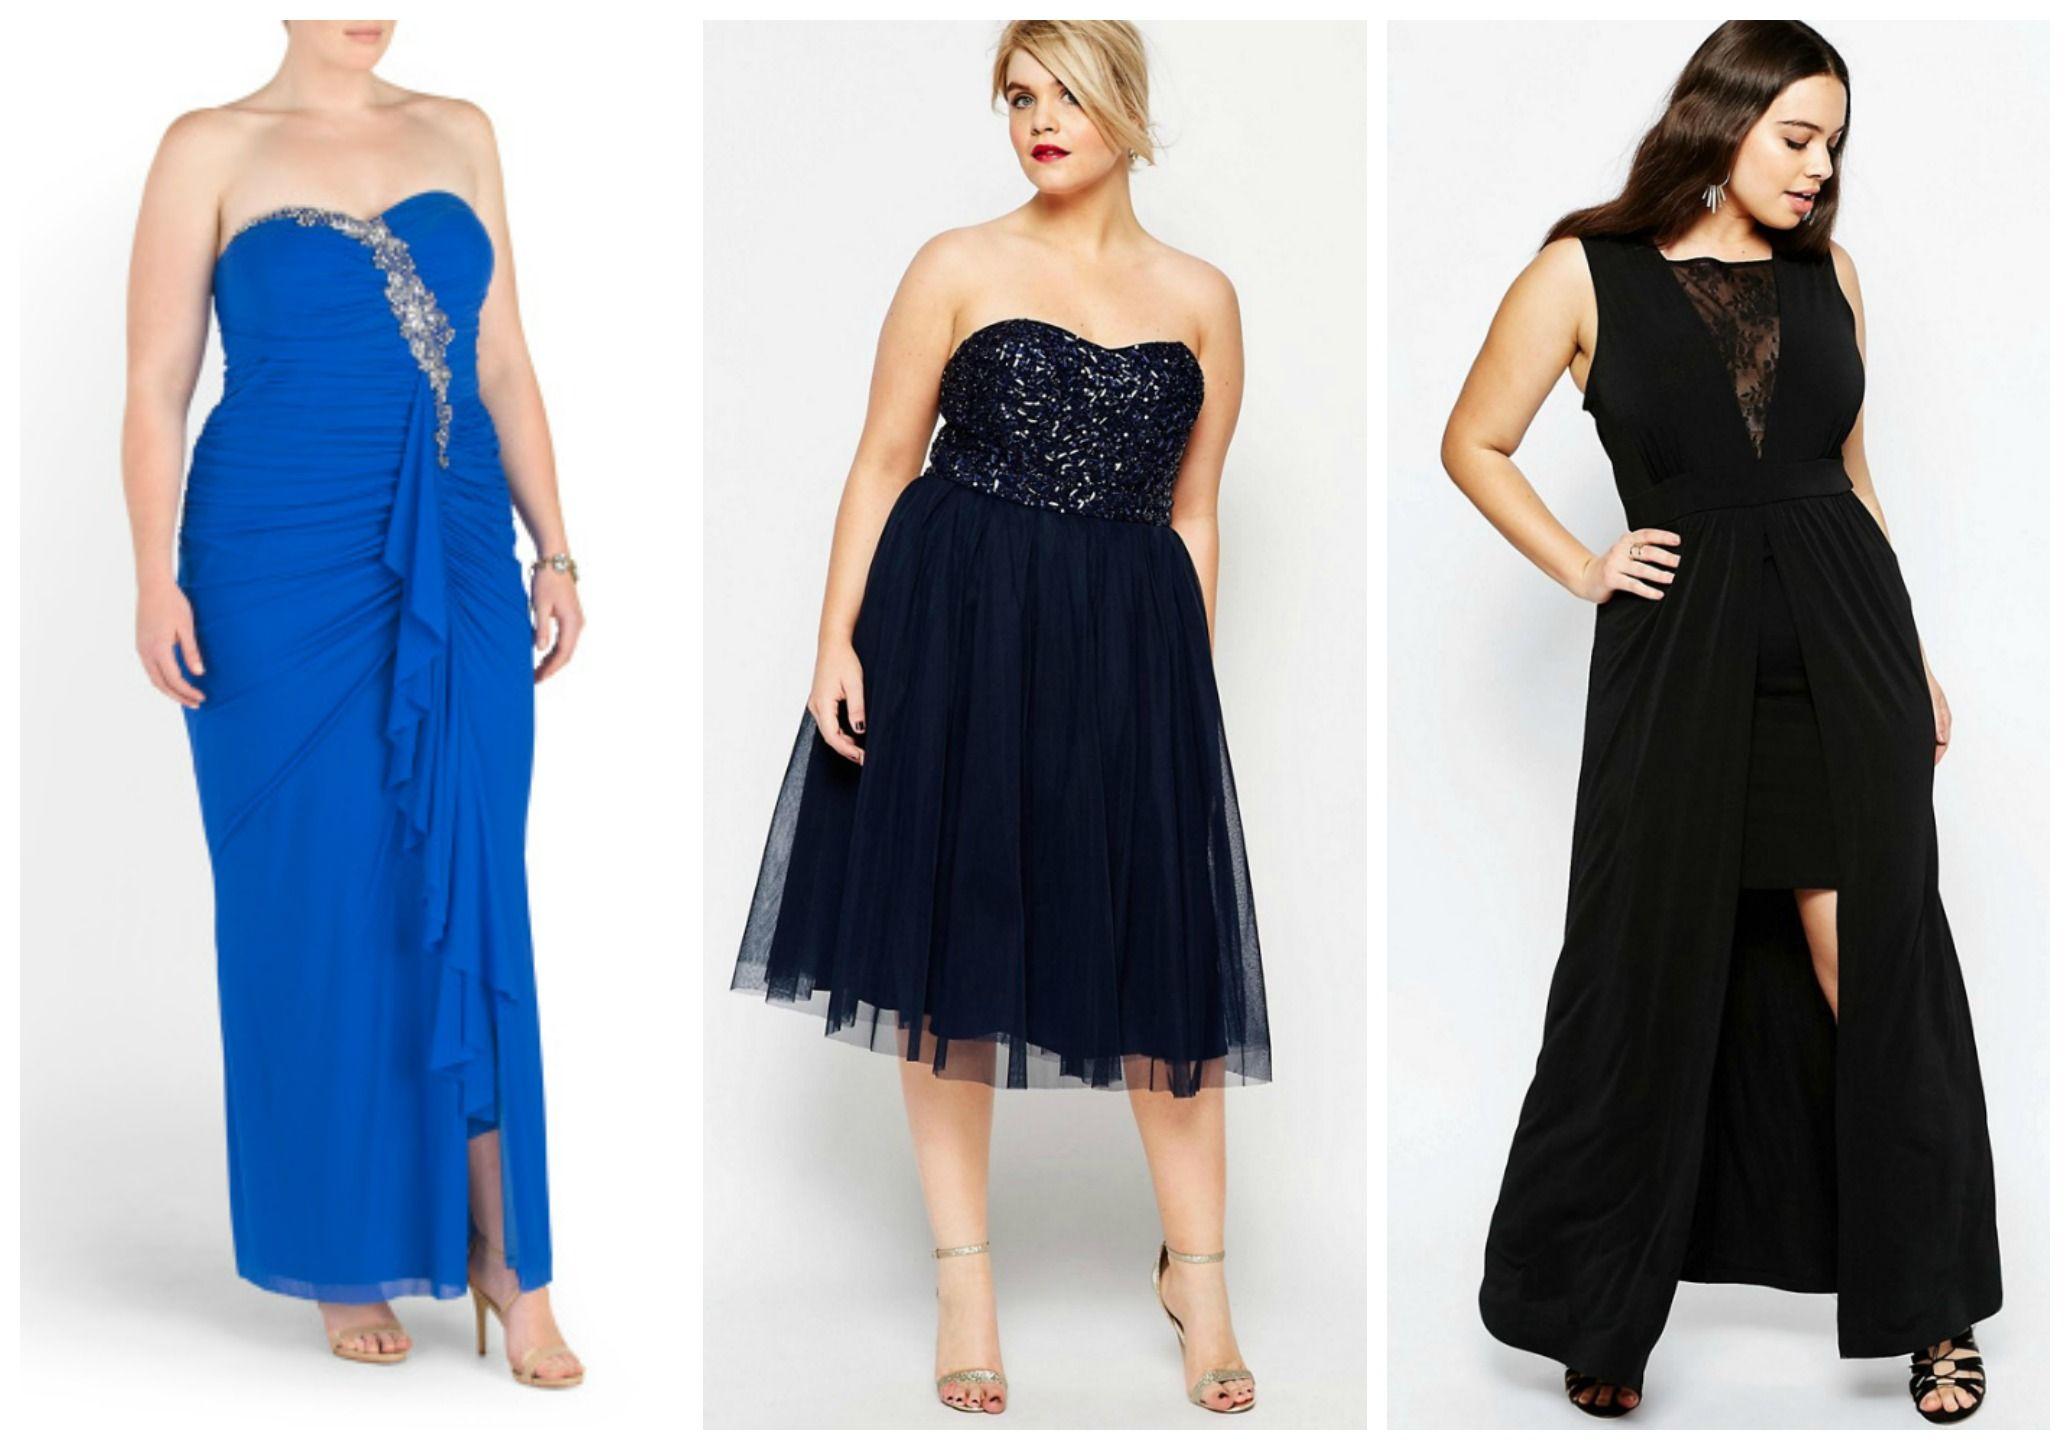 Plus size prom dresses less than beautiful dresses